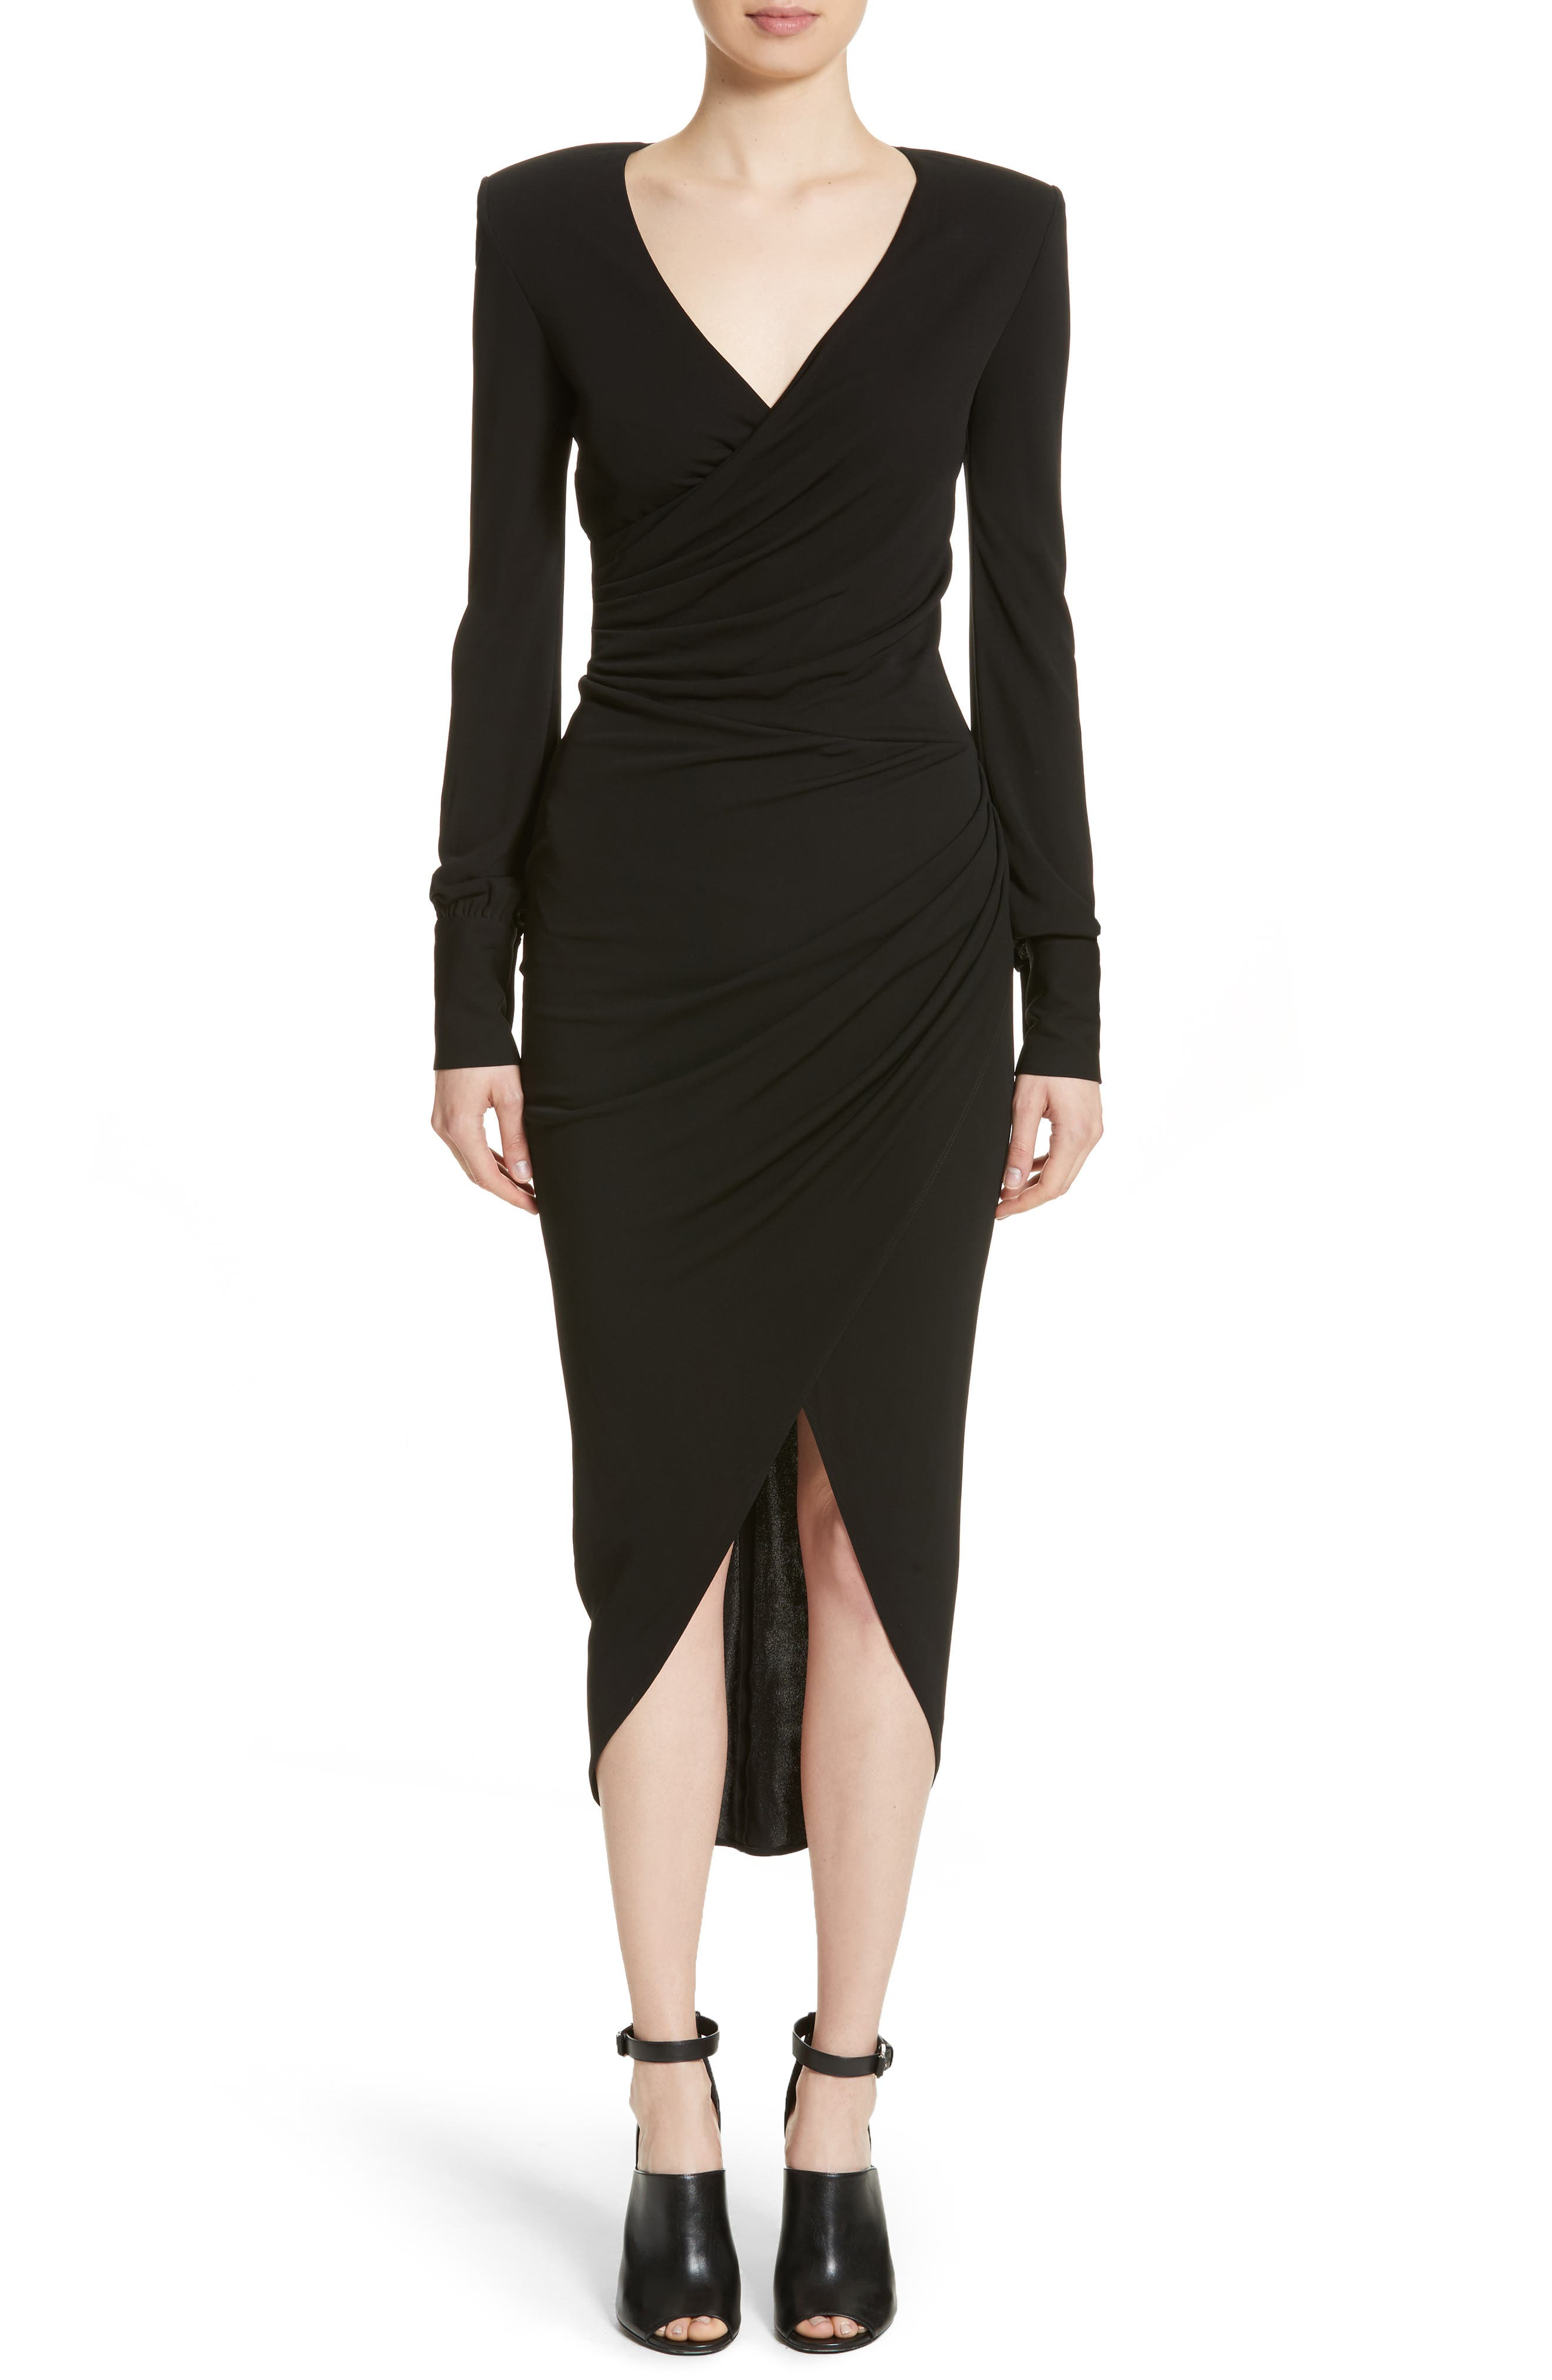 Main Image - Michael Kors Stretch Jersey Wrap Dress